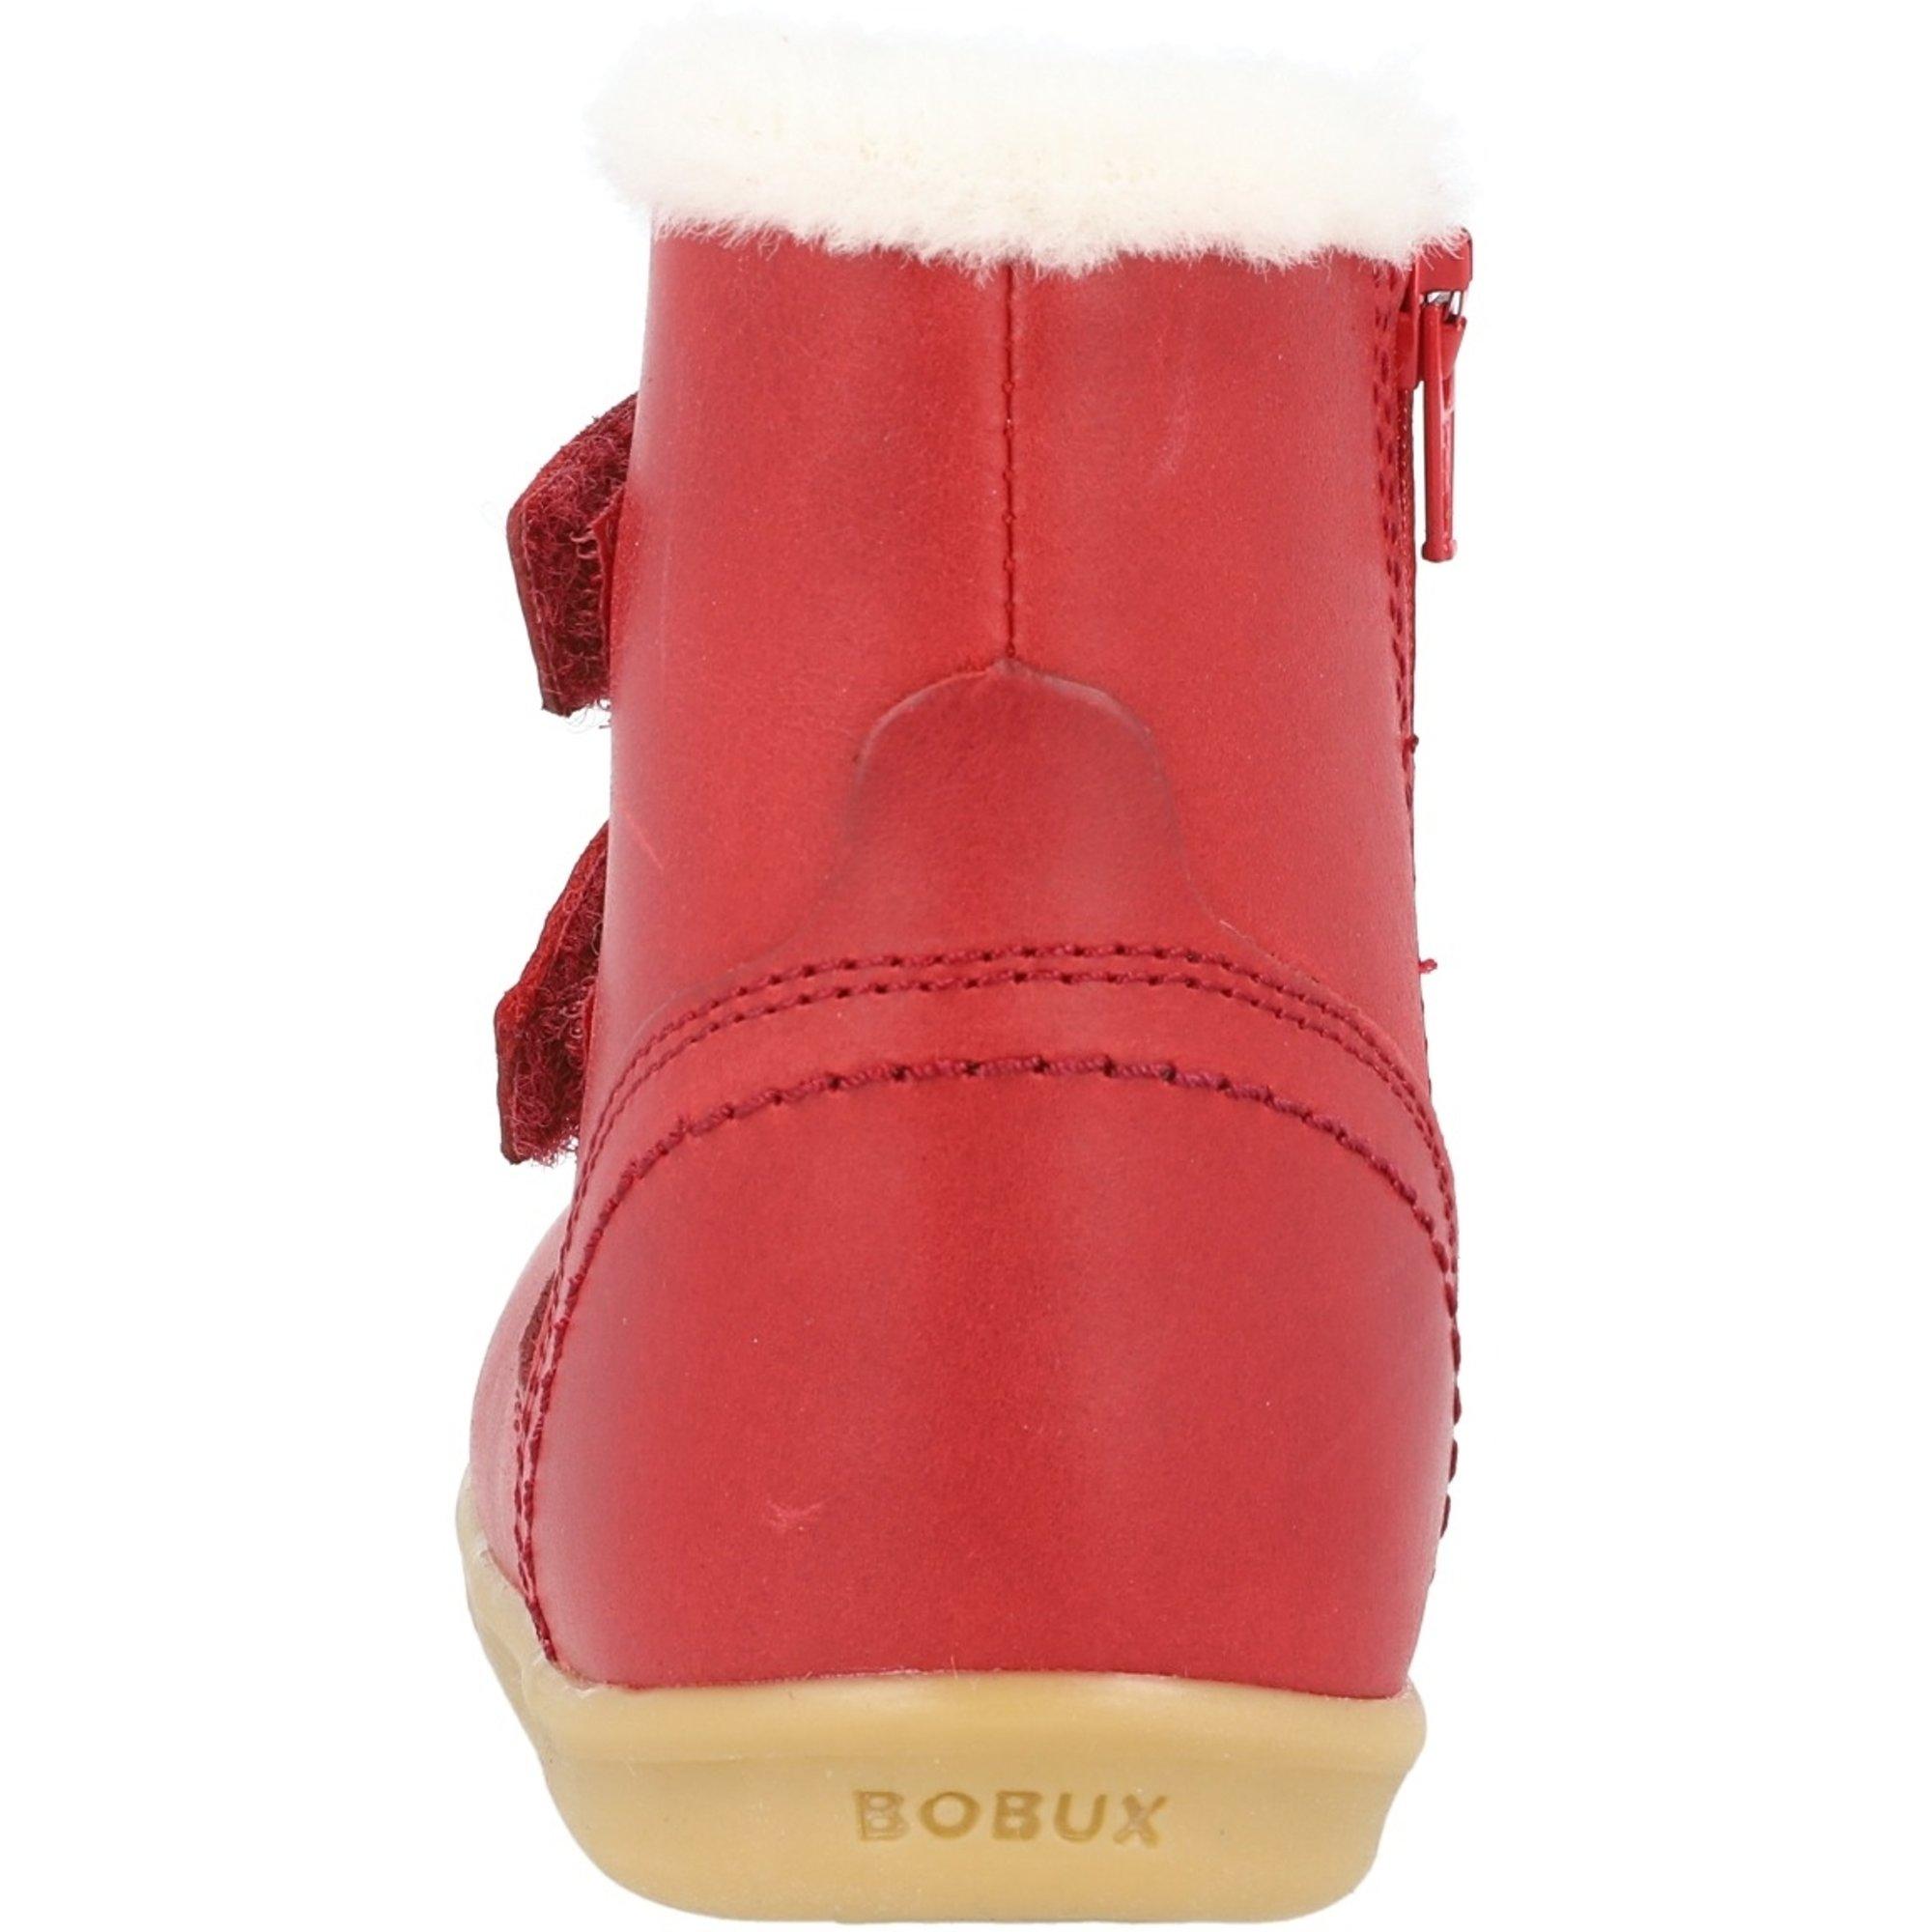 Bobux i-Walk Aspen Rio Red Leather